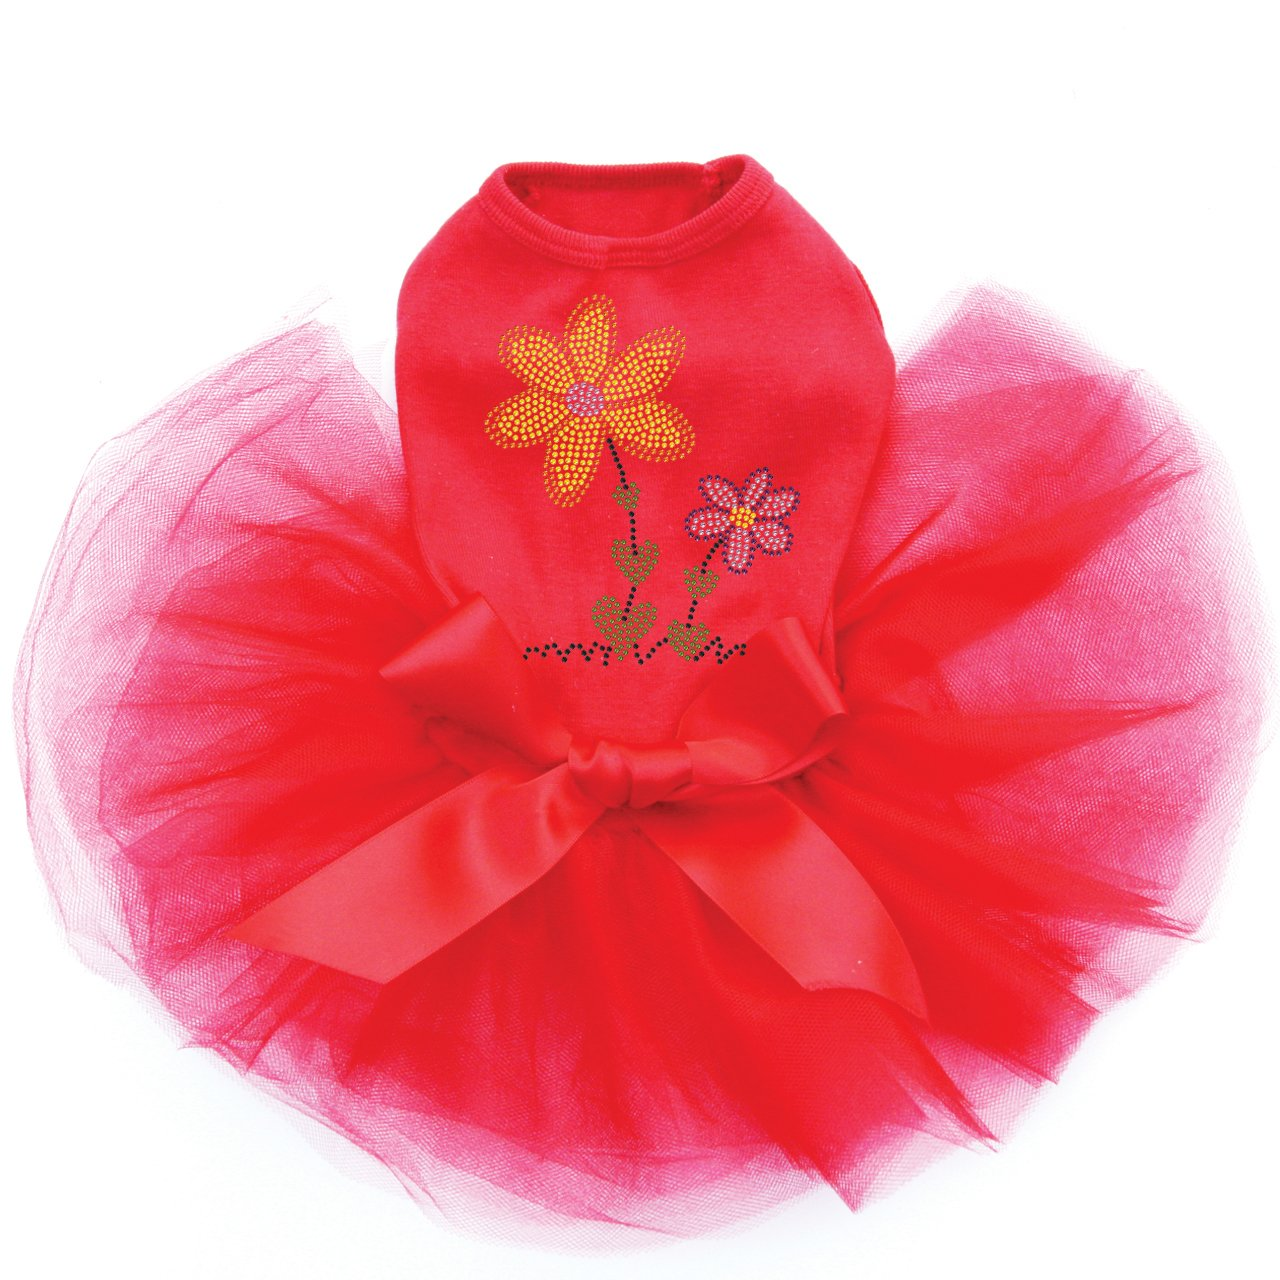 Orange & Purple Flowers - Bling Rhinestone Dog Tutu Dress, L Red by Dog in the Closet